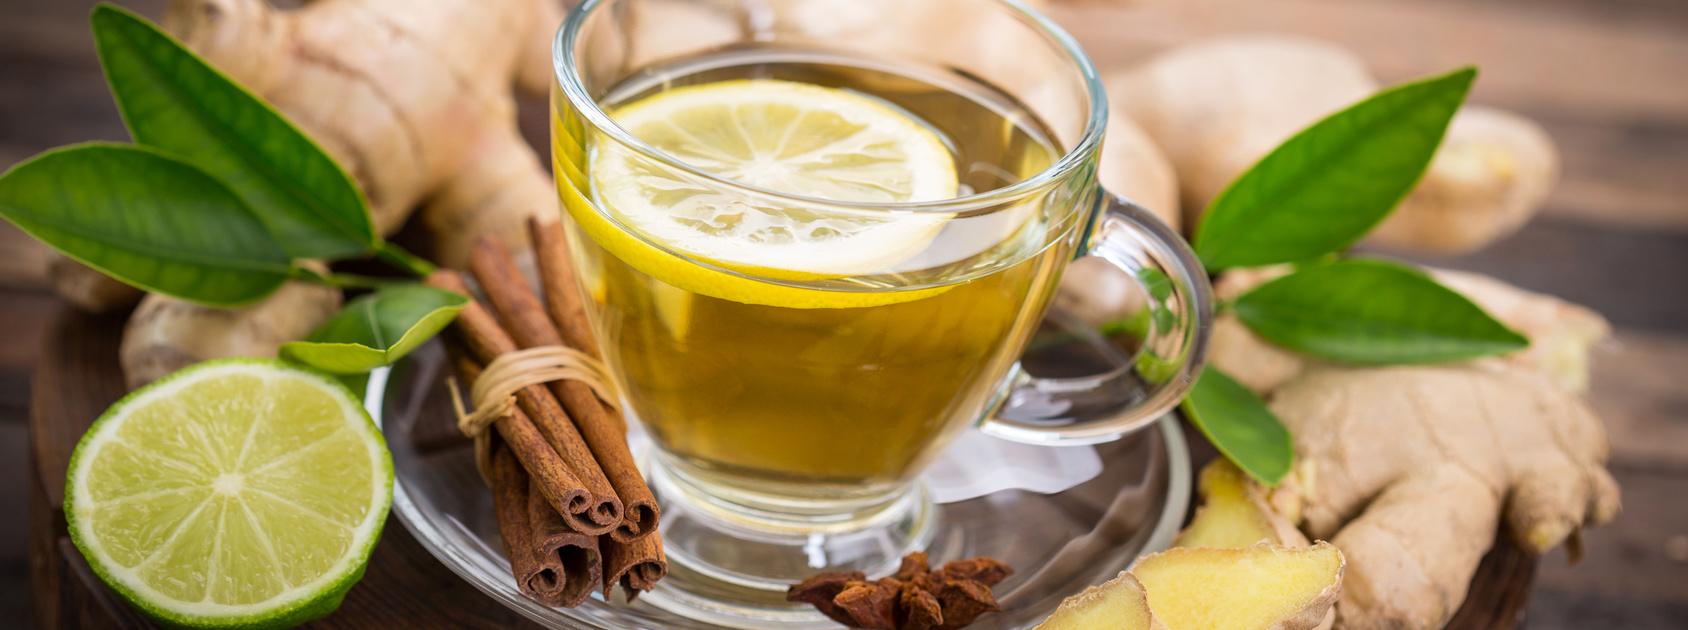 VALLEE herboristerie tisane thé